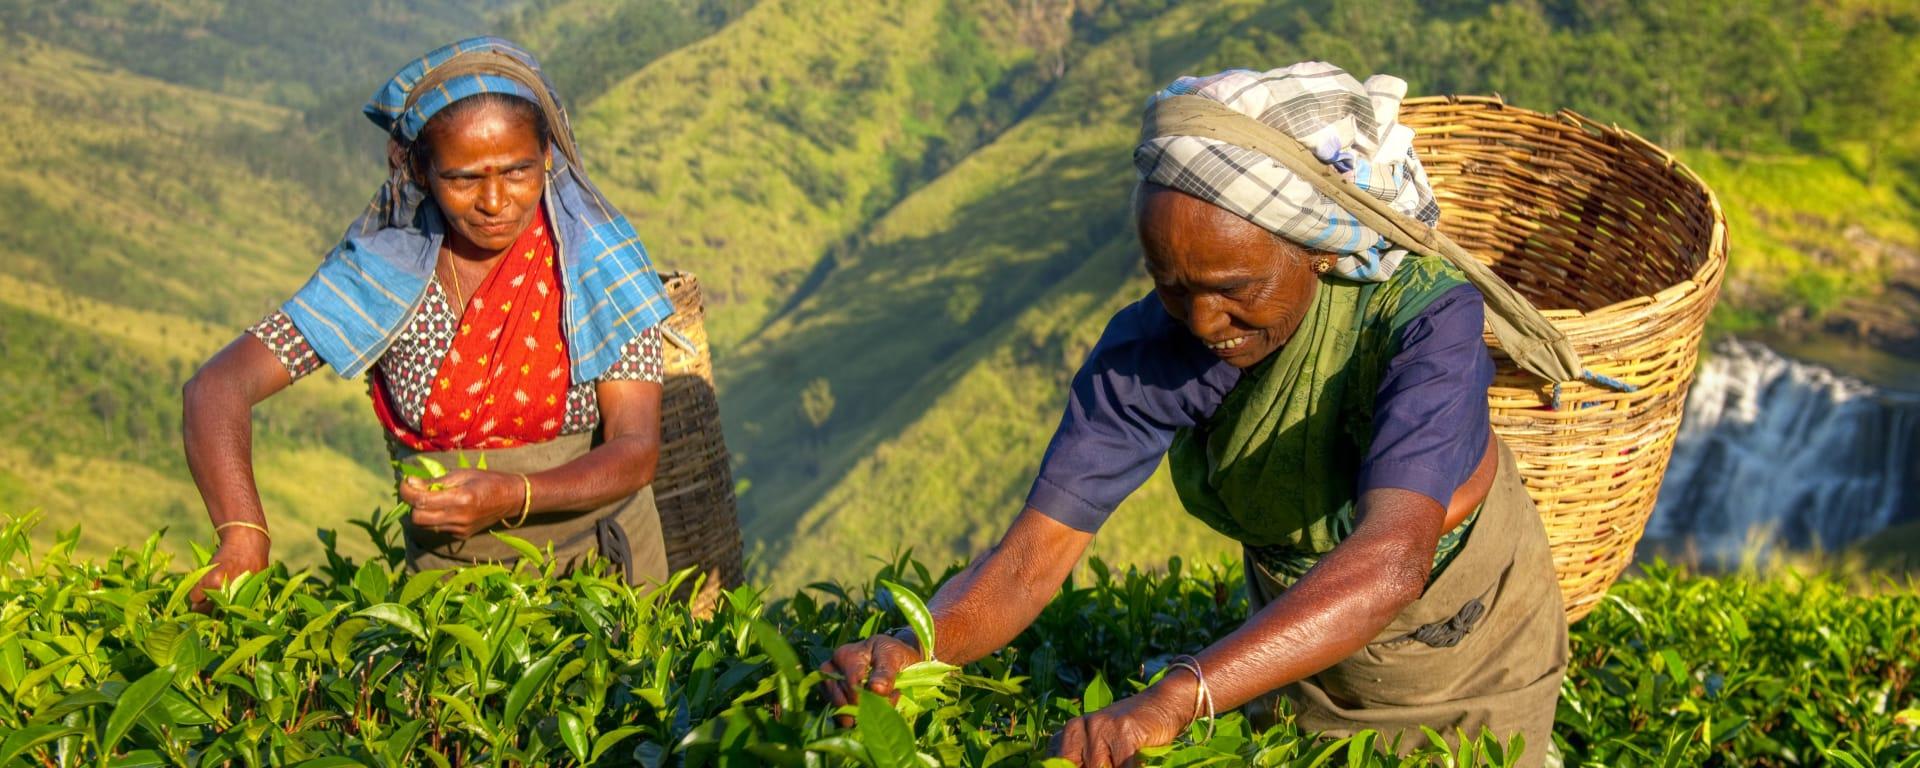 Sri Lanka entdecken mit Tischler Reisen: Sri Lanka Teeplantage